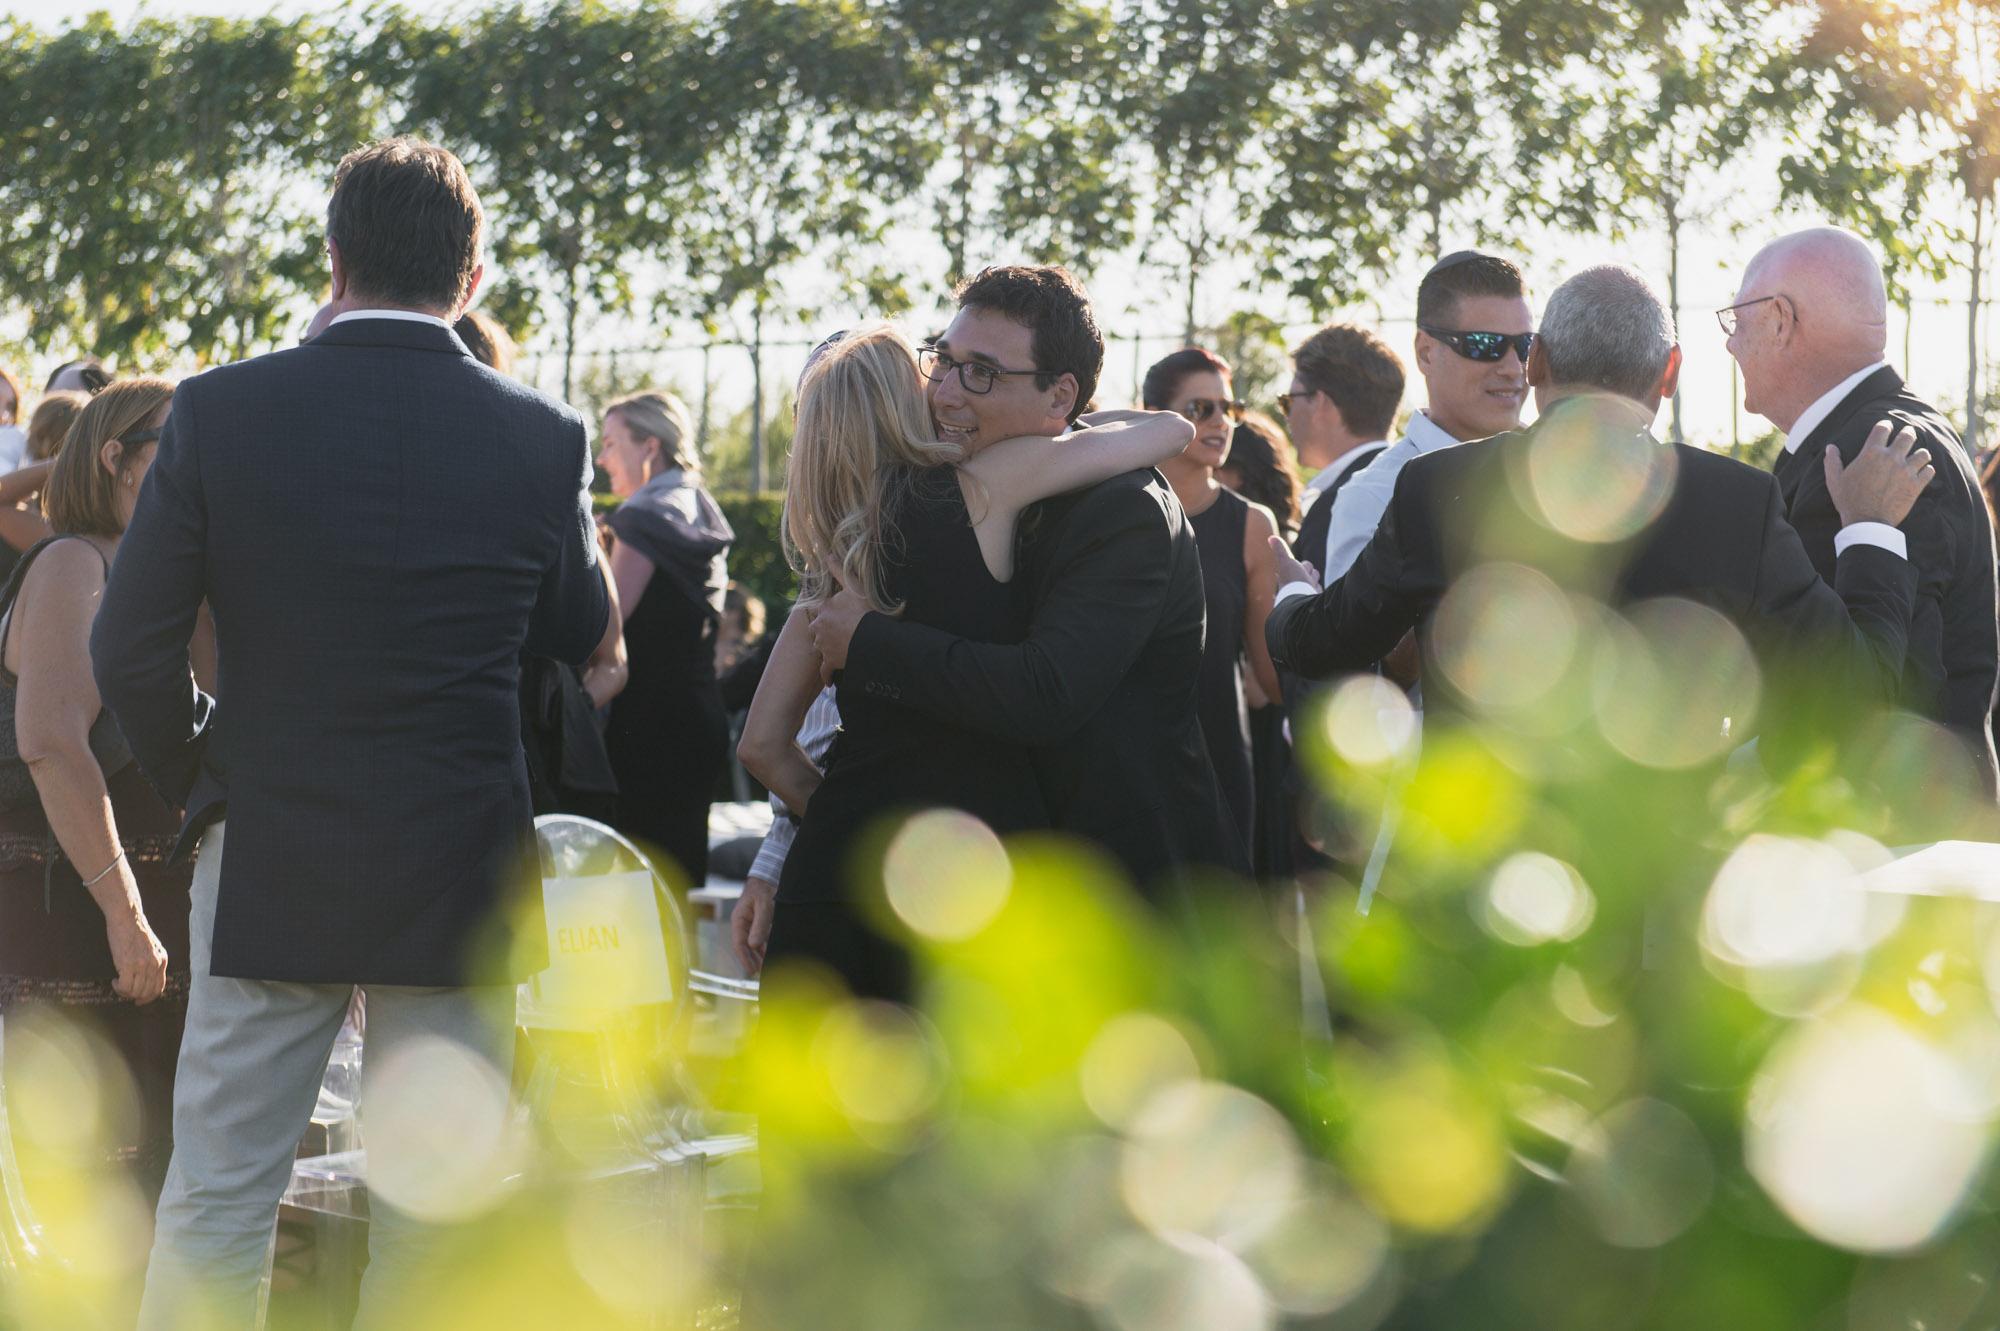 john-henry-wedding-photographer-kiara-ashley-001-16.jpg